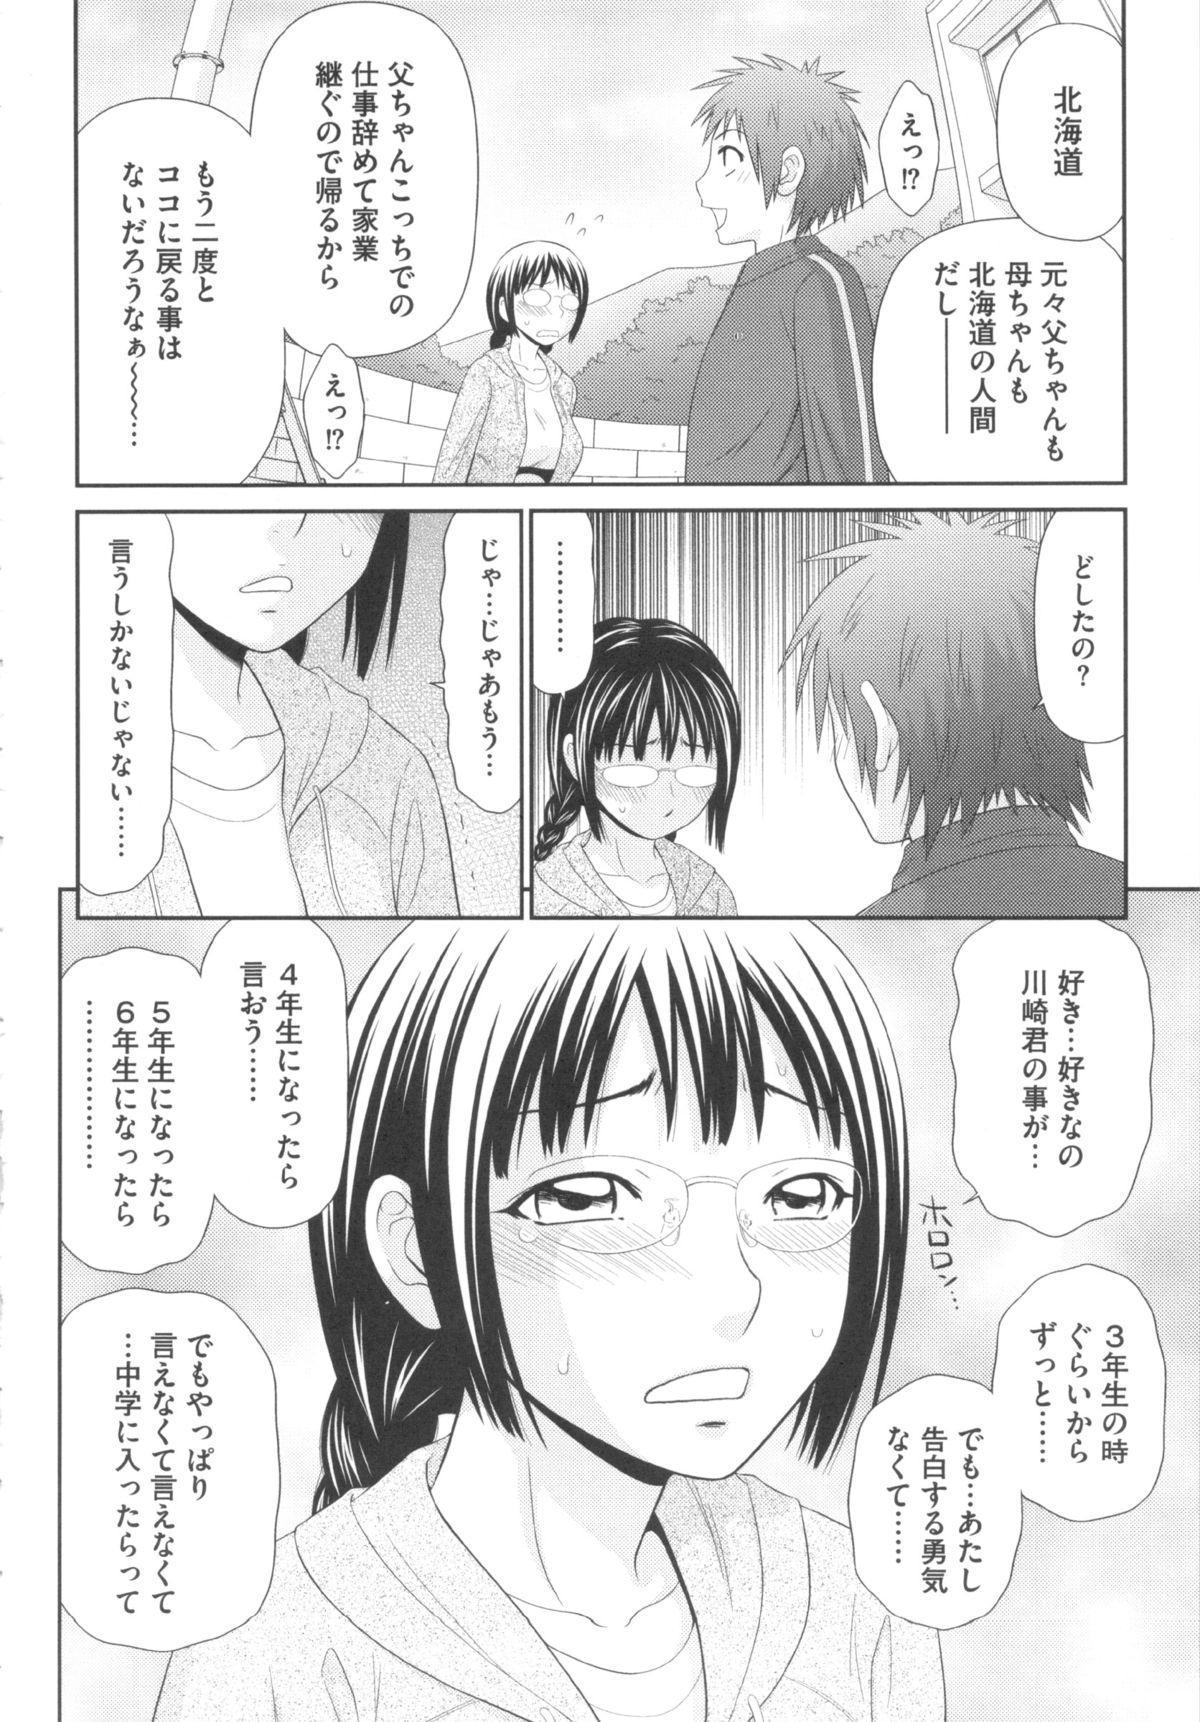 Kiseki No Zaajiru - Sperm of Miracle 168